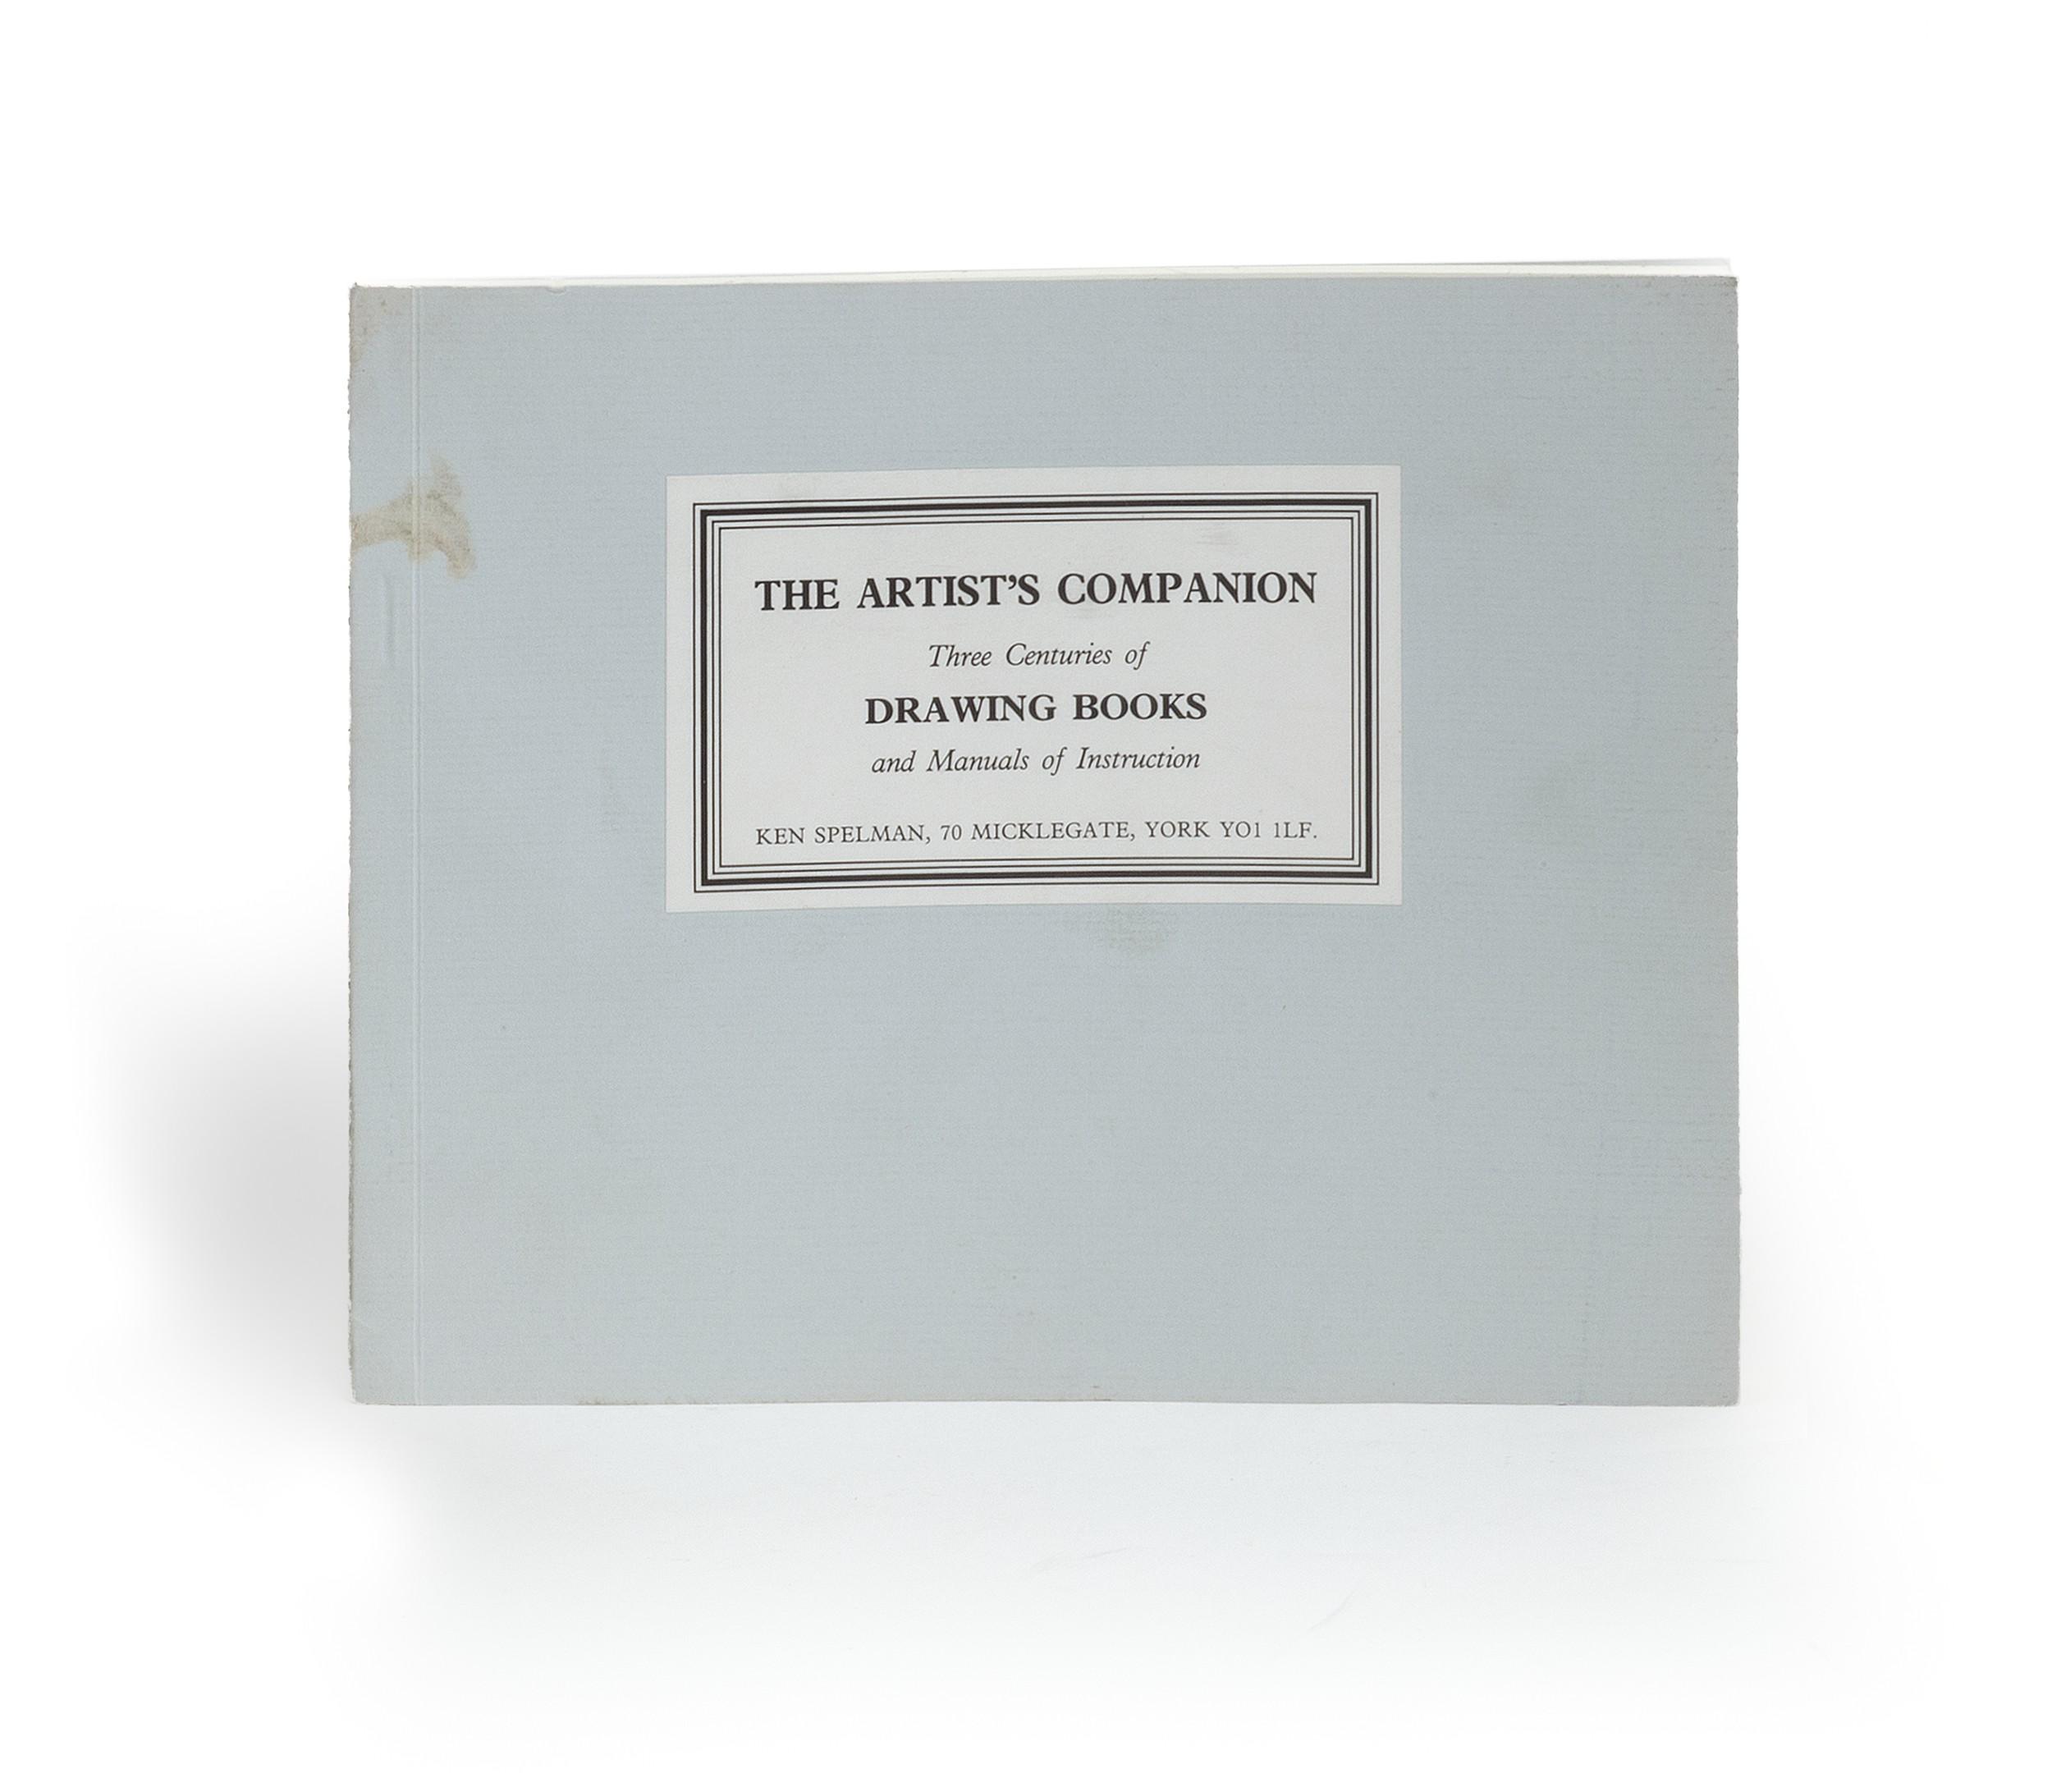 https://www.robinhalwas.com/1128/093500-ken-spelman-stock-catalogues-the-artist-s-companion.jpg